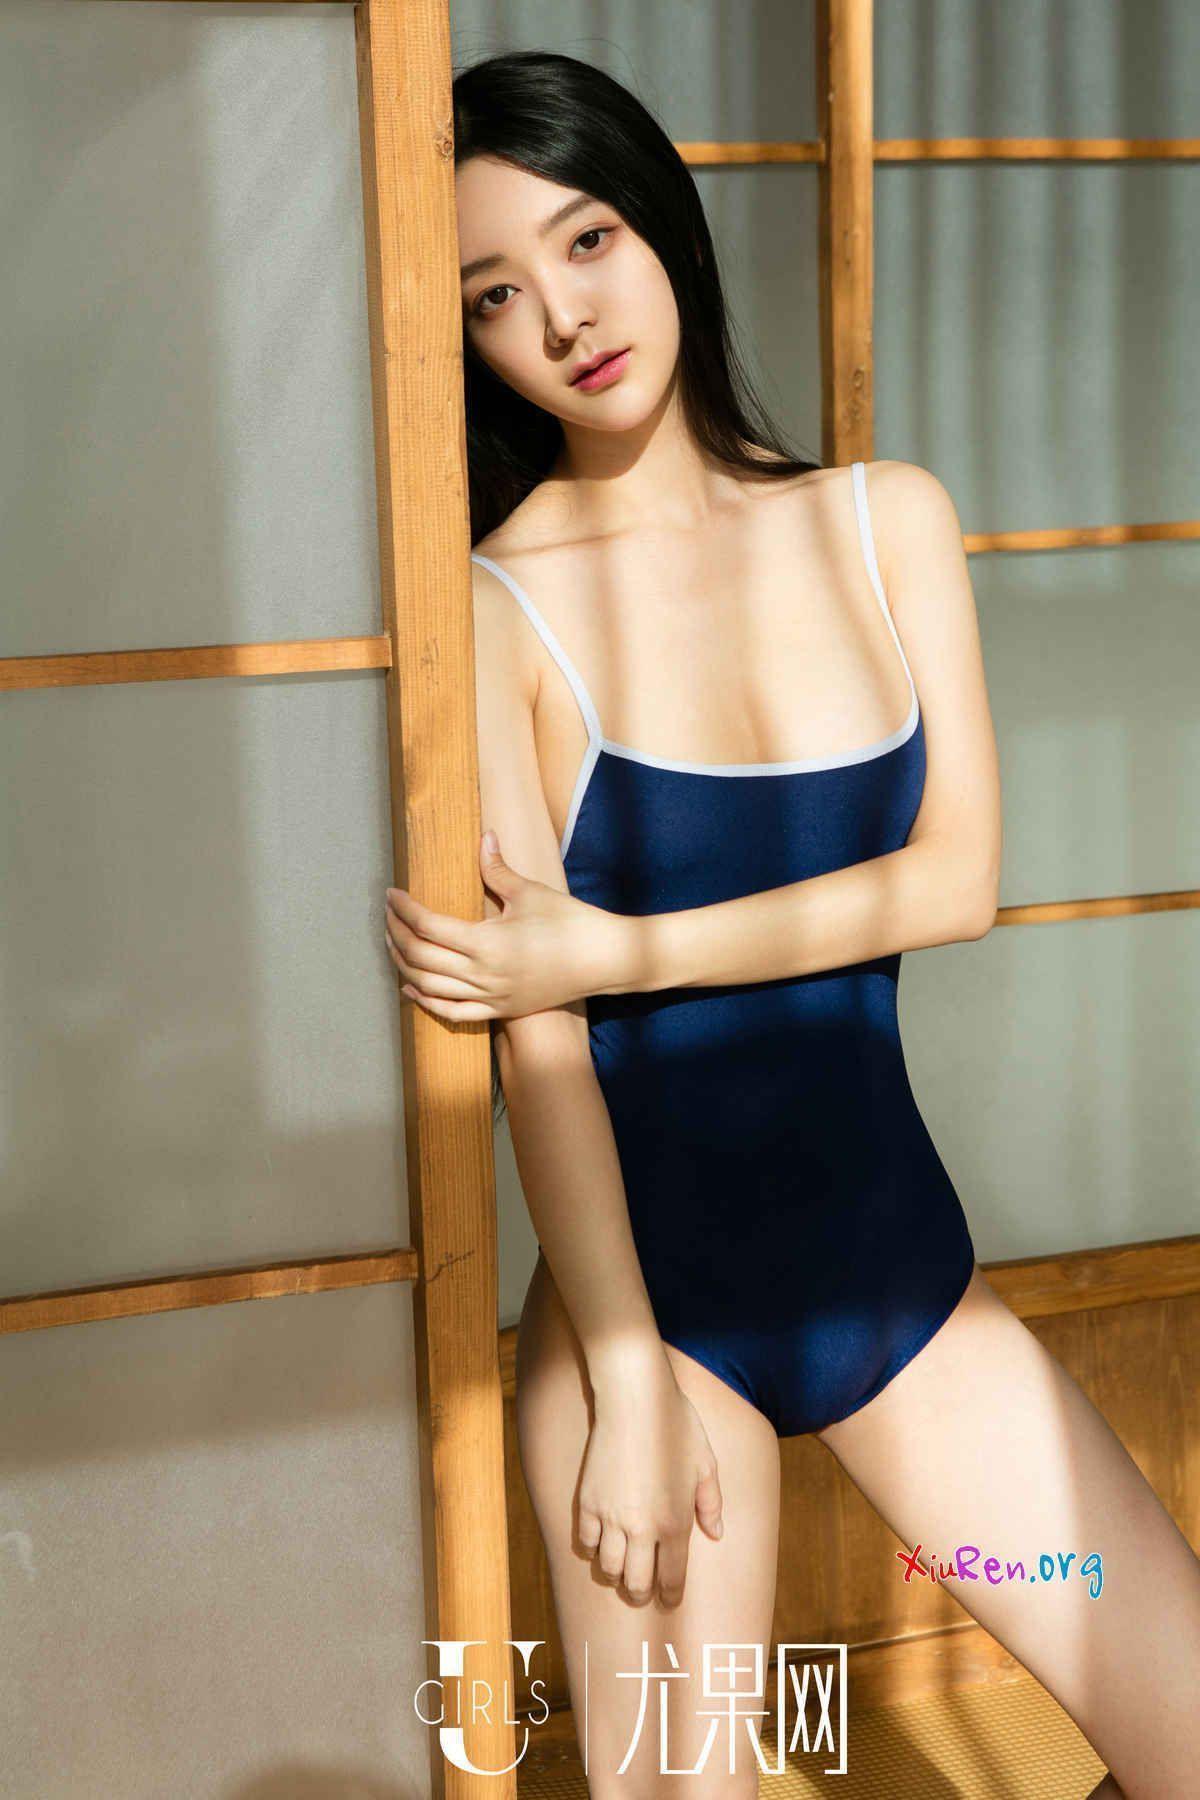 Asian girls butt commit error